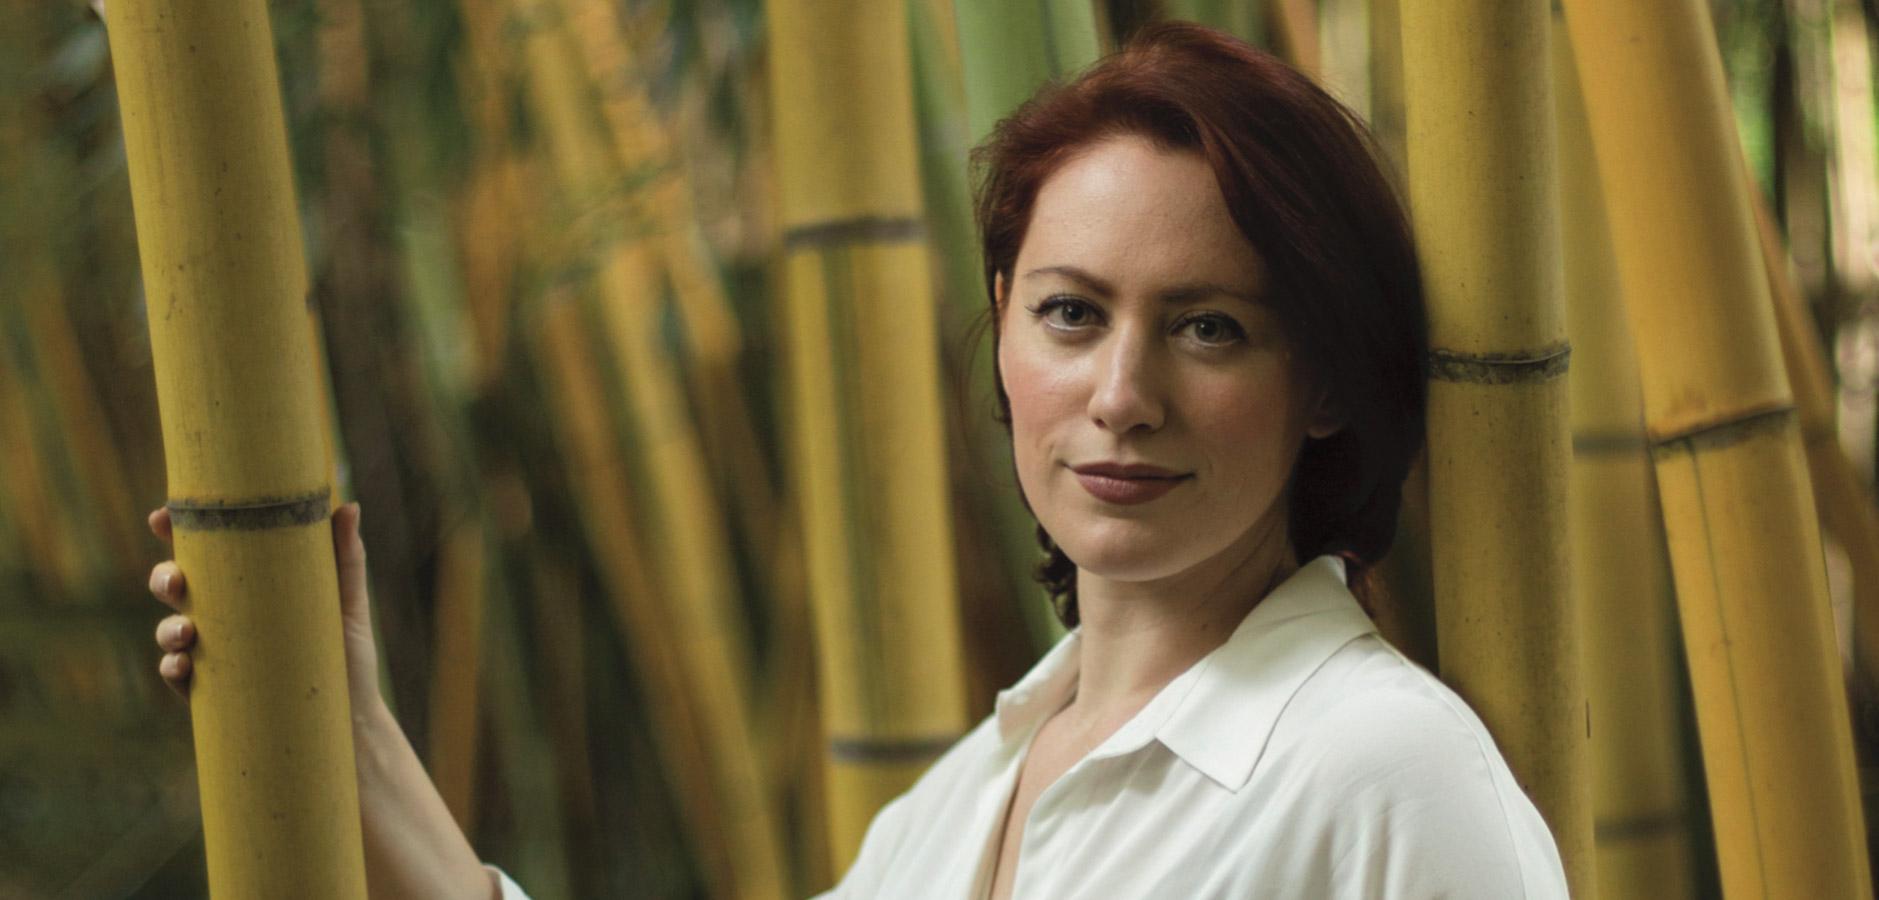 Melissa Golden